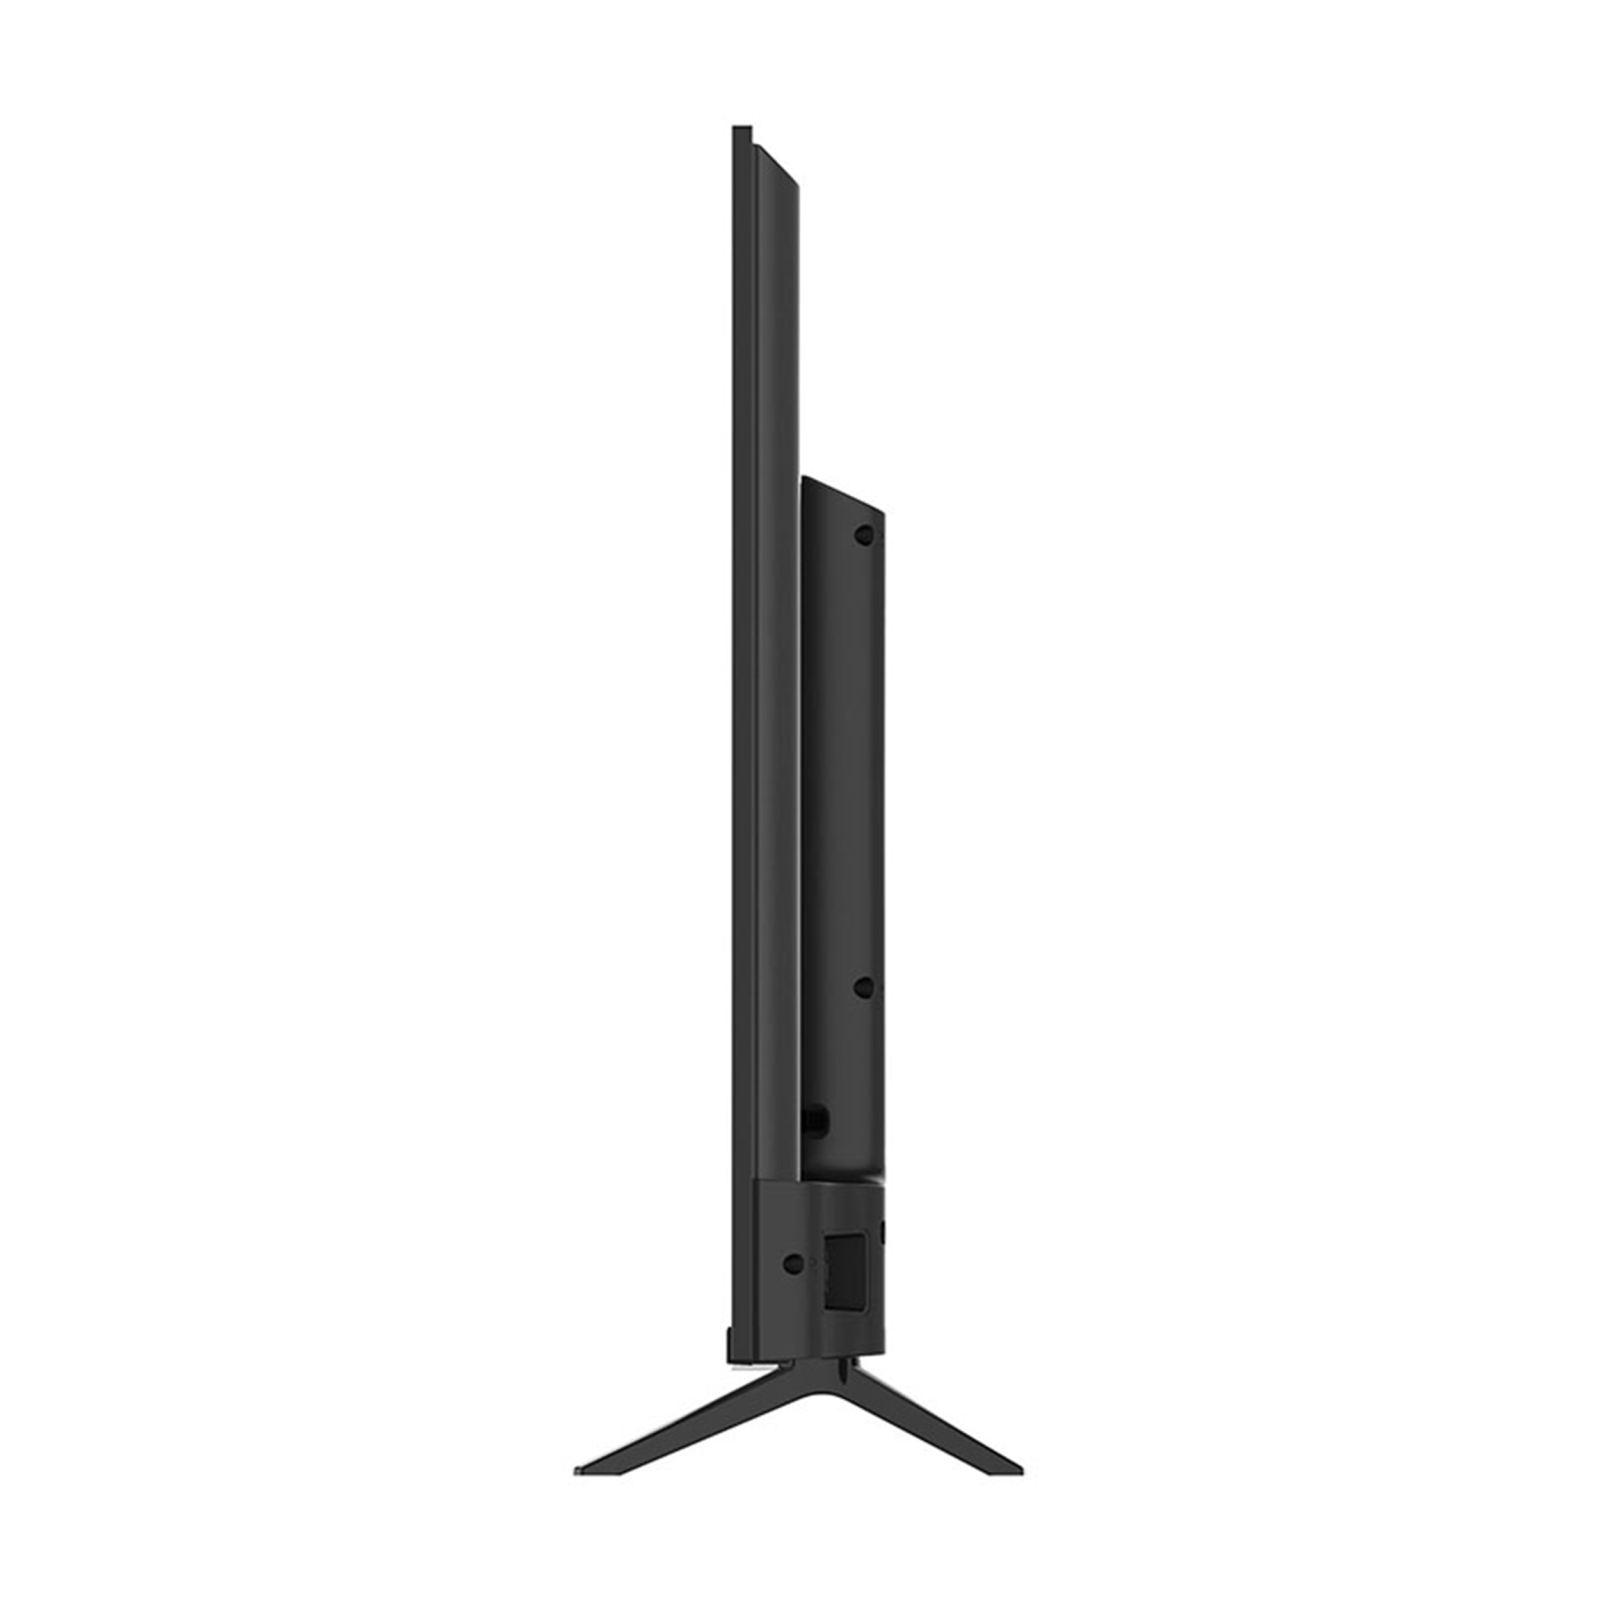 تلویزیون ال ای دی هوشمند اسنوا مدل SSD-55SA620U سایز 55 اینچ main 1 5